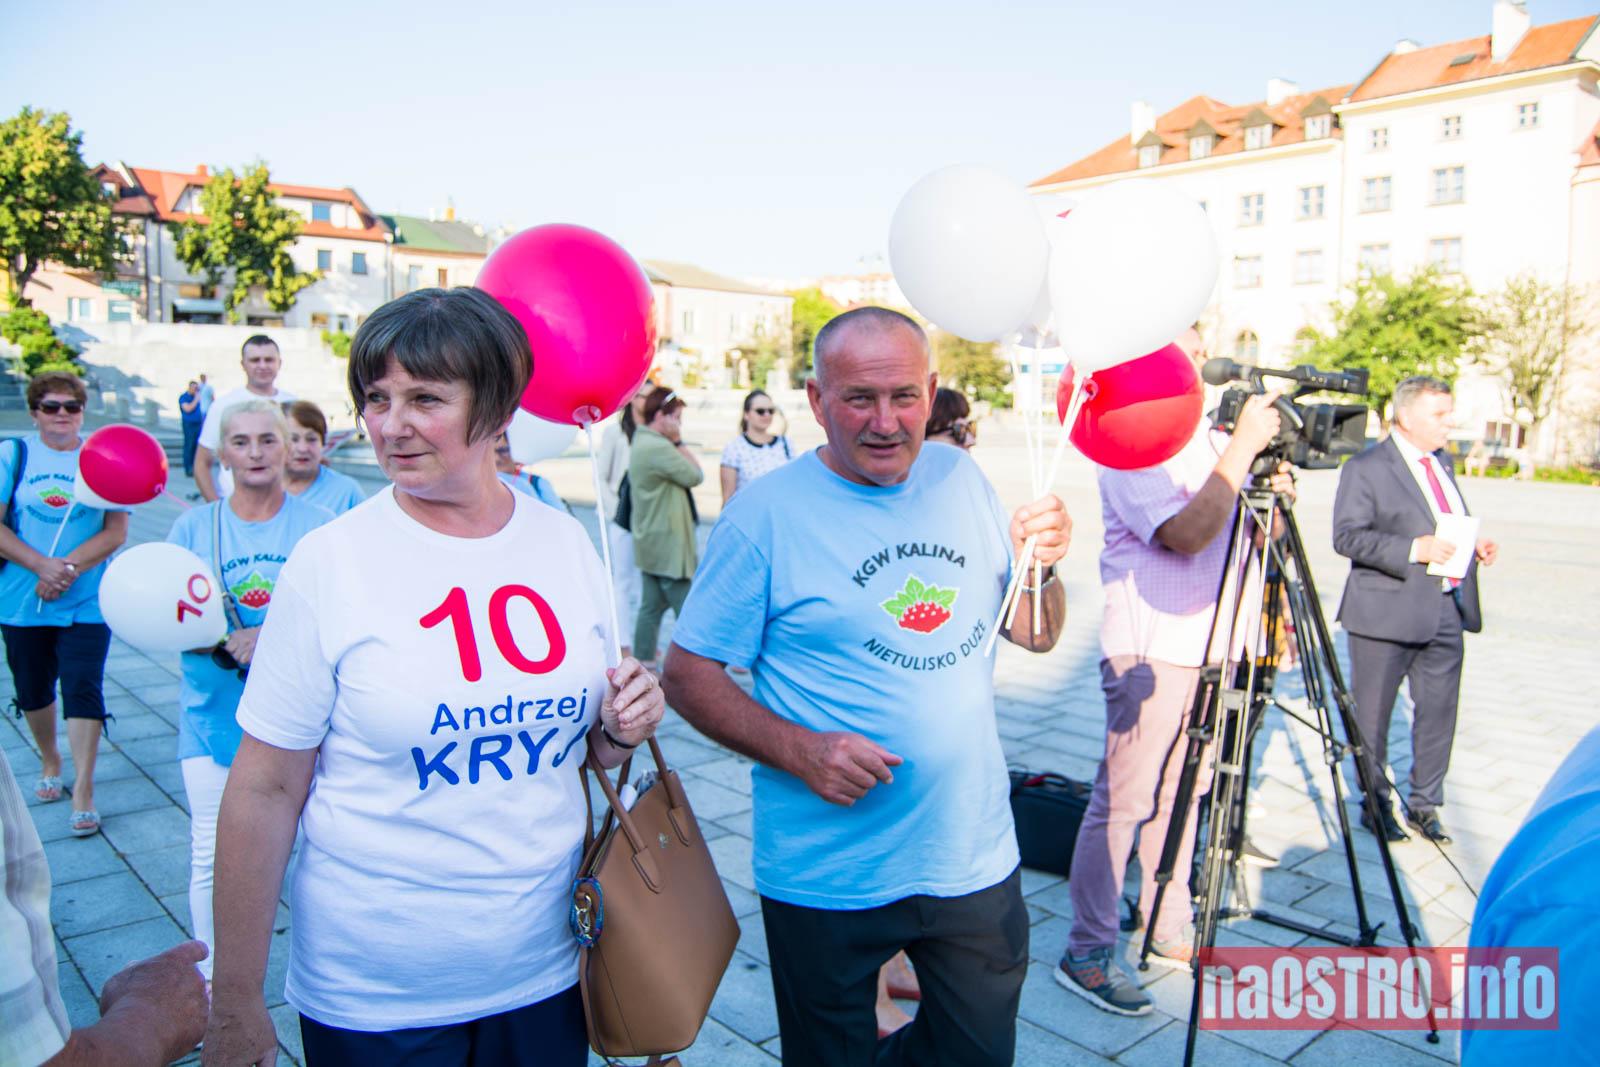 NaOSTRO Andrzej Kryj kampania-2